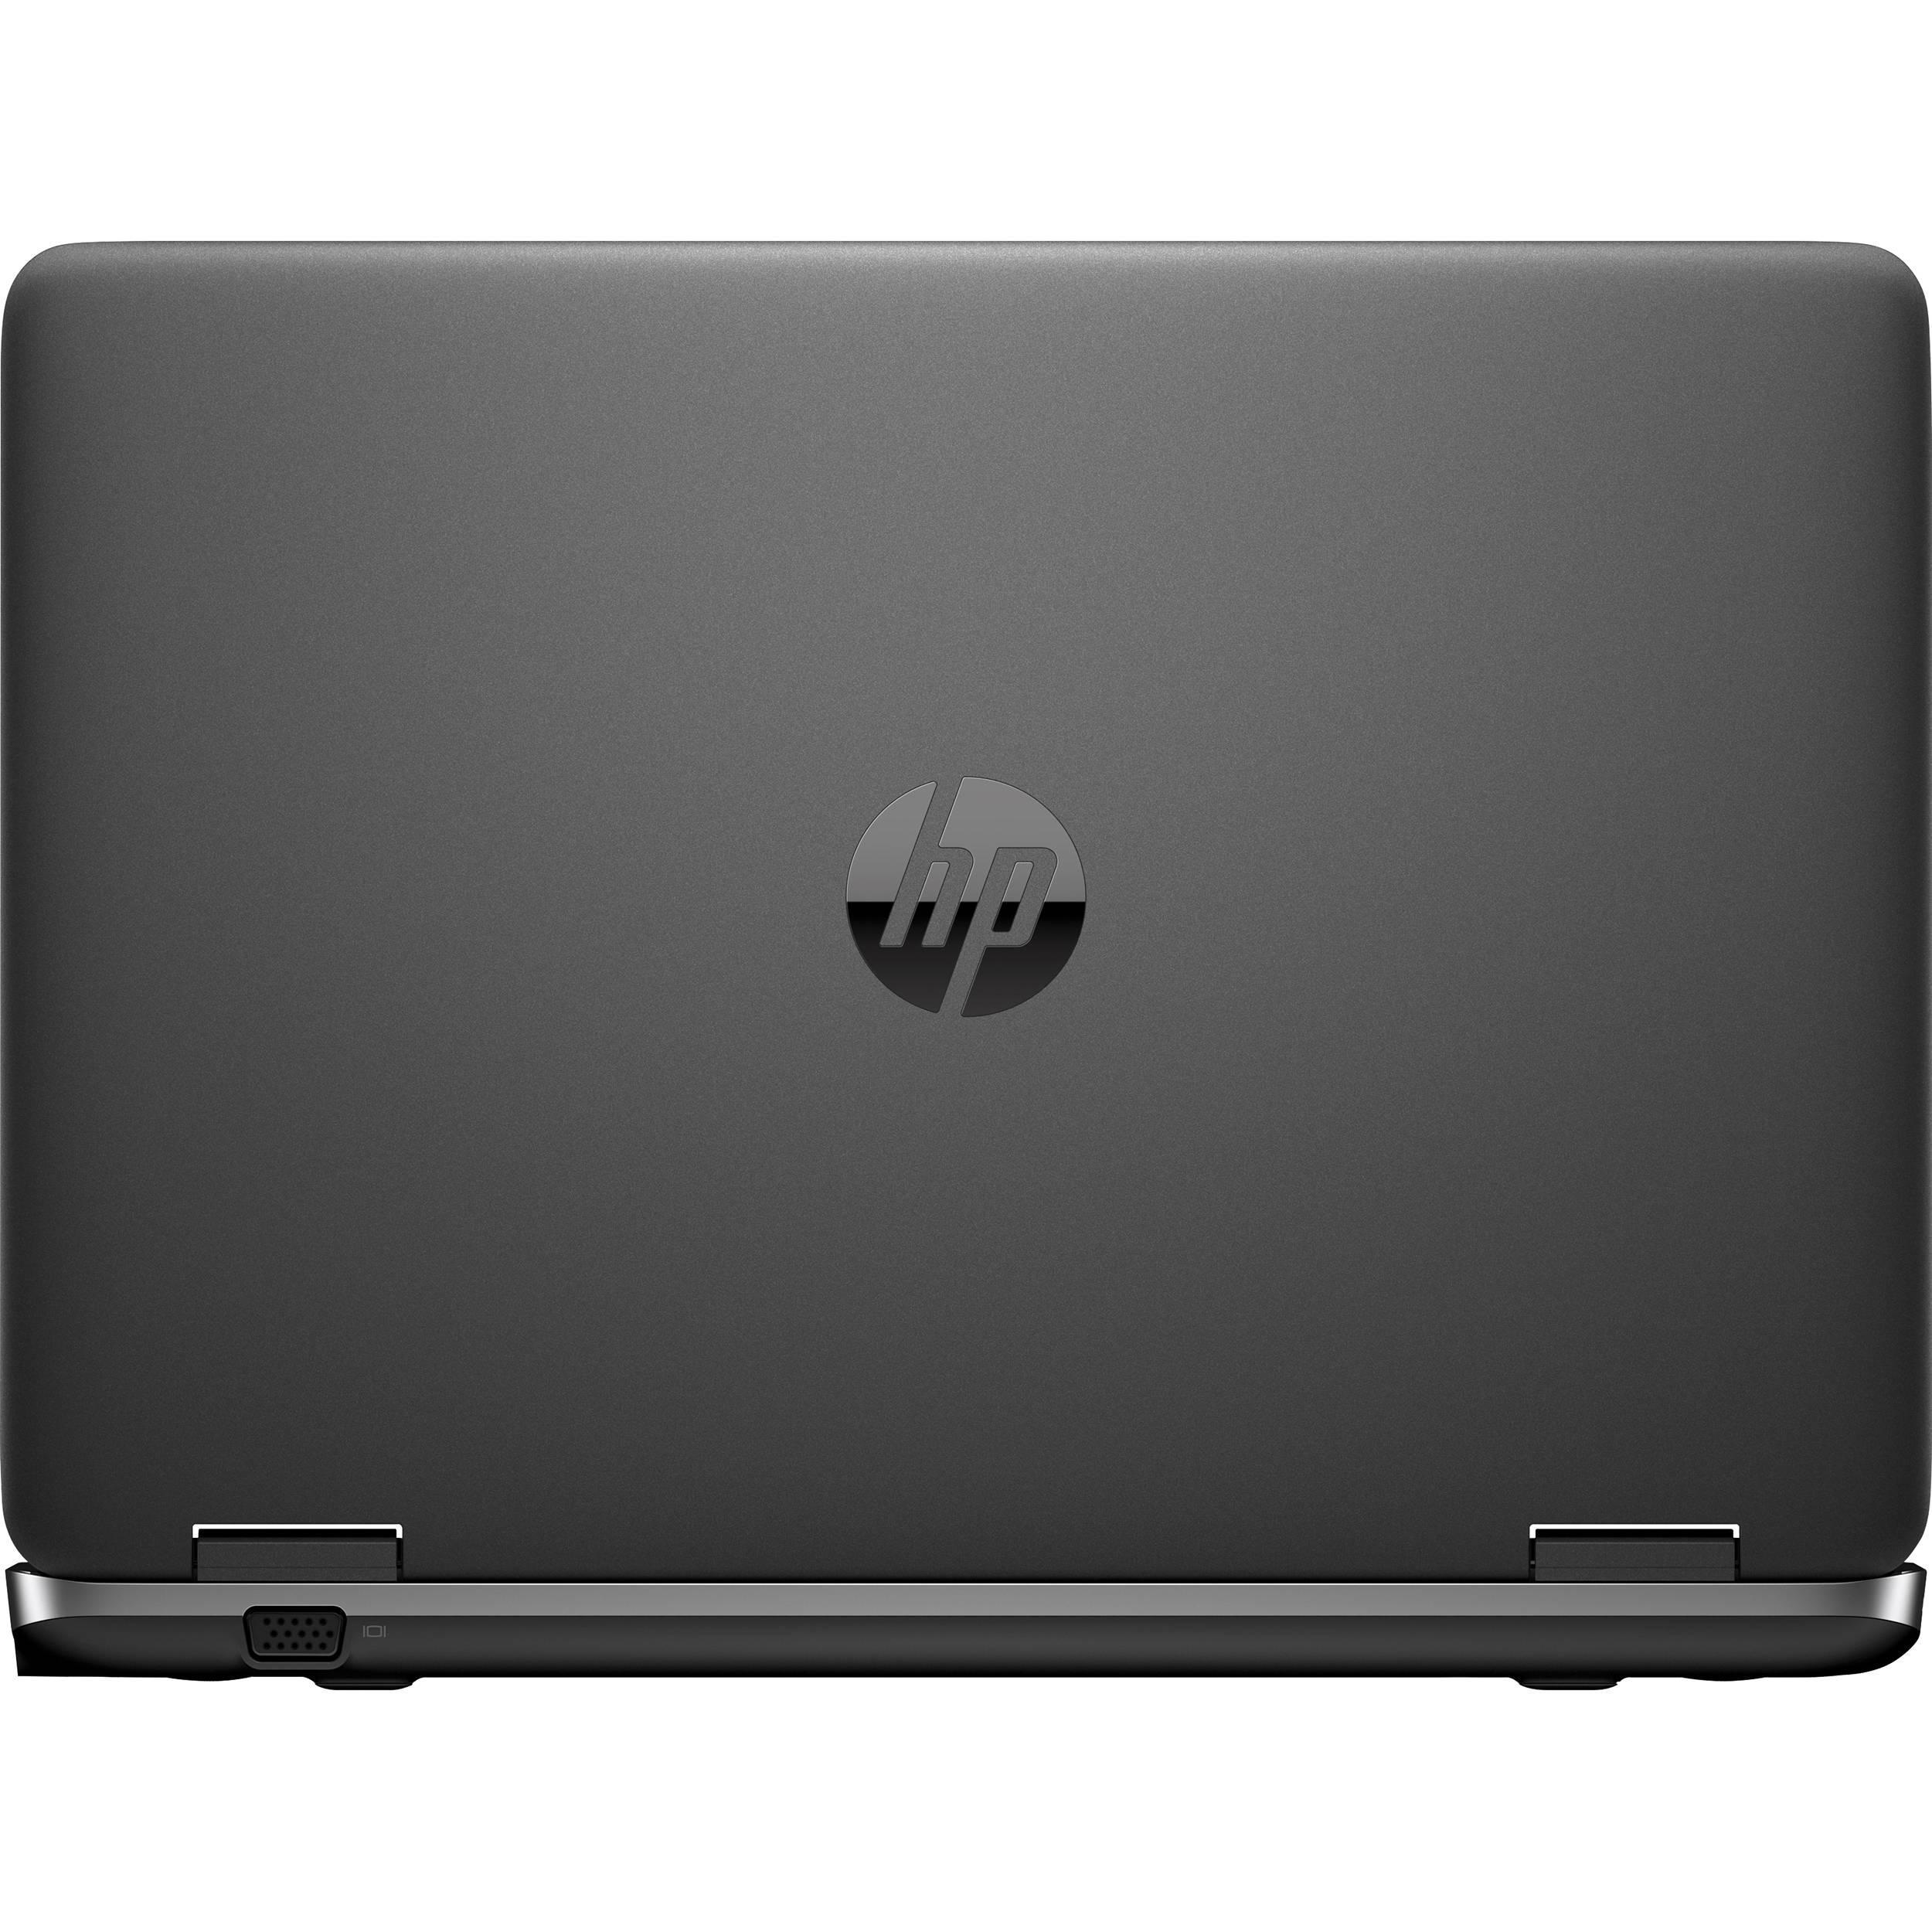 Hp Probook 650 G2 15.6-inch (2016) - Core i5-6200U - 4 GB - HDD 500 GB